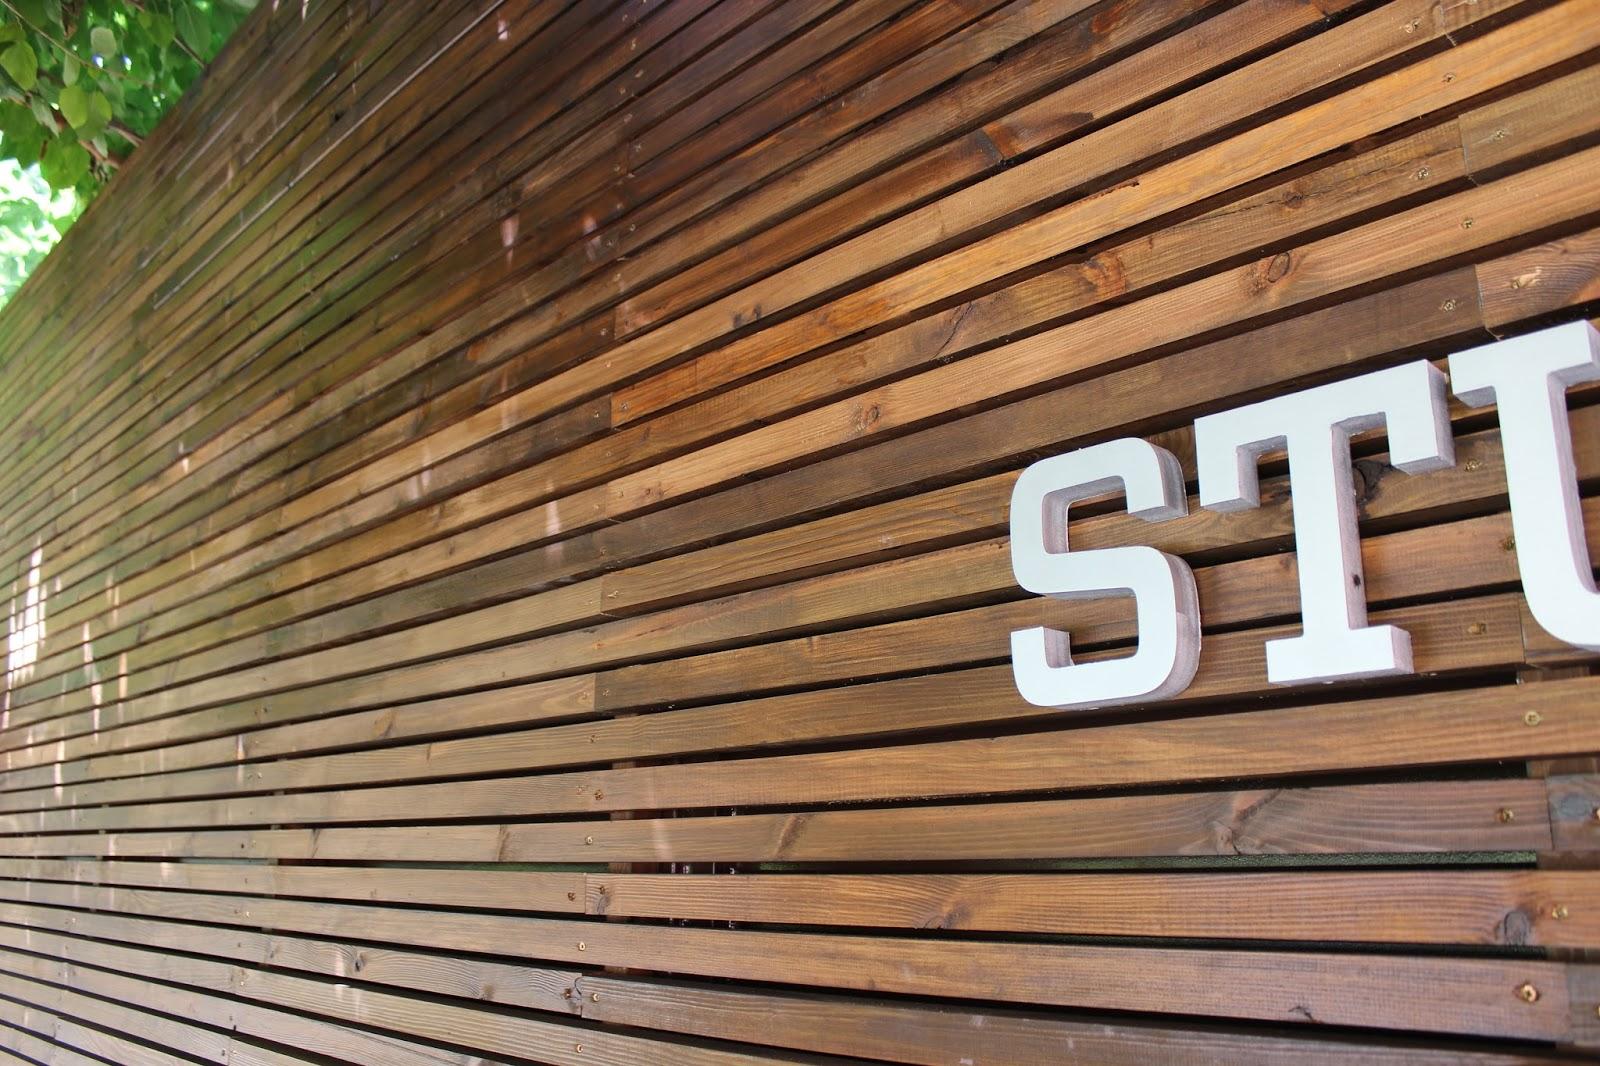 Listones de madera exterior trendy listones madera de - Listones de madera para exterior ...